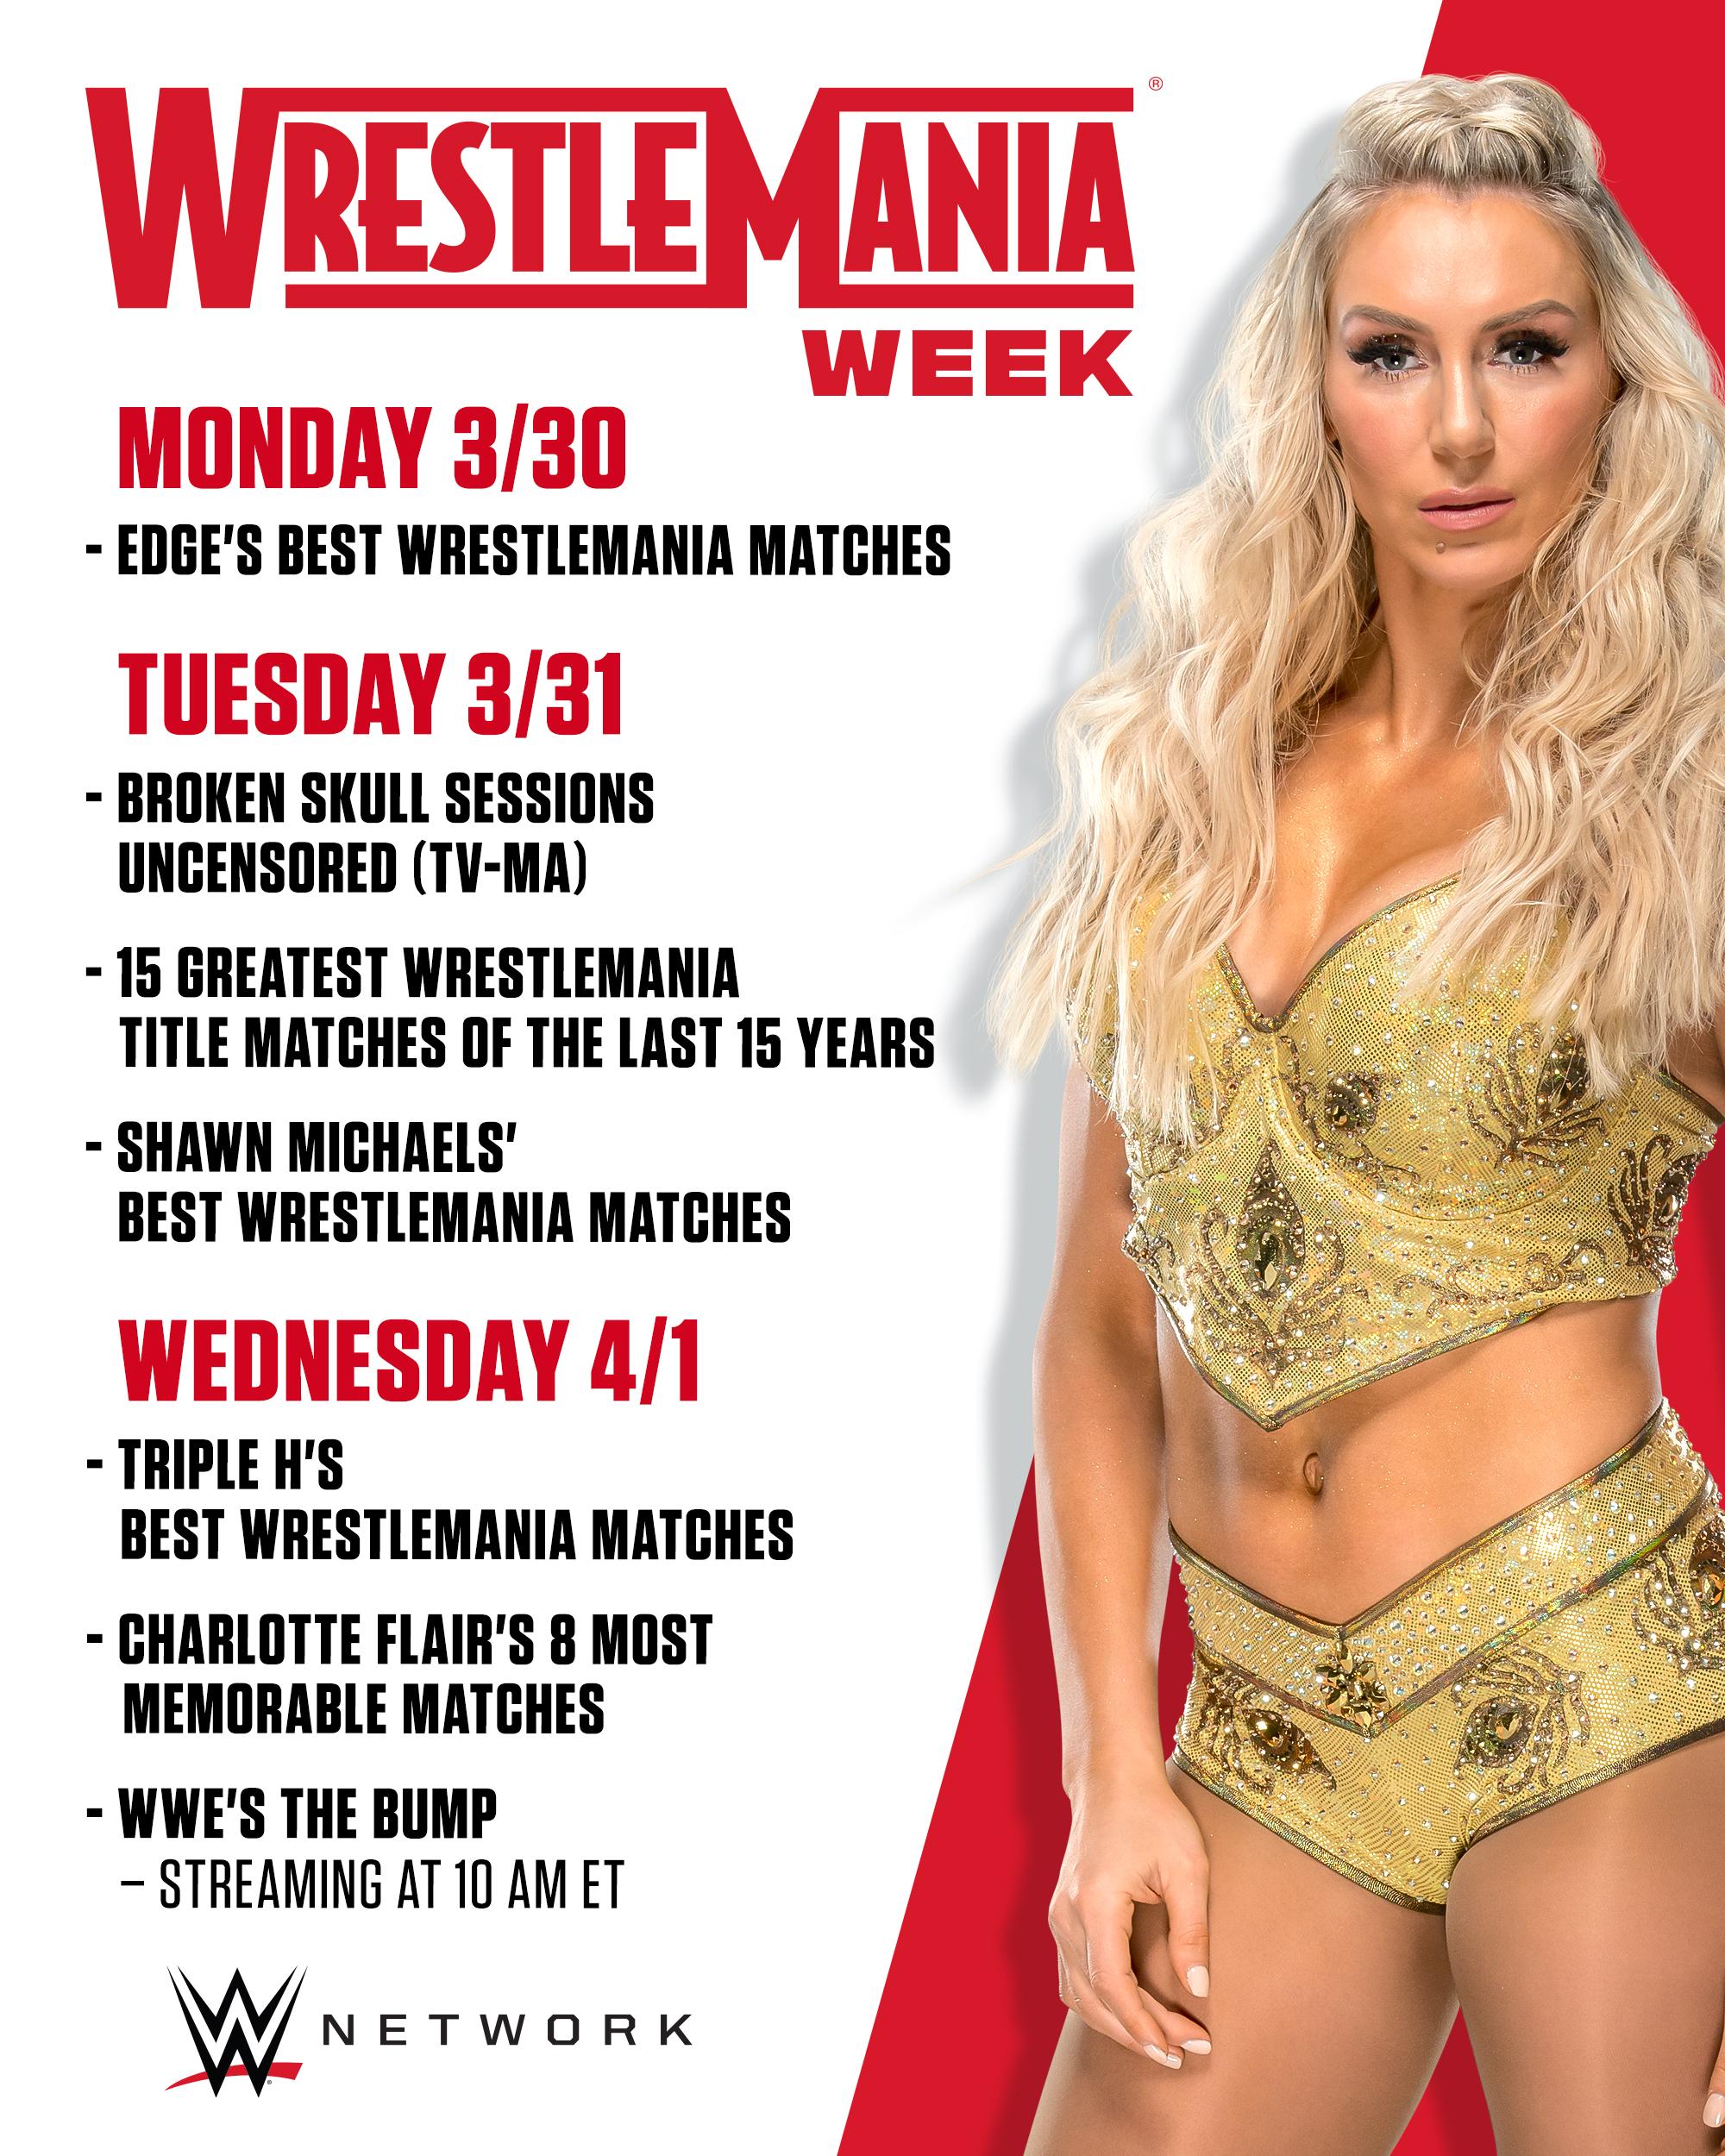 Wrestlemania Week Announced On WWE Network; List Of Programs Revealed 2